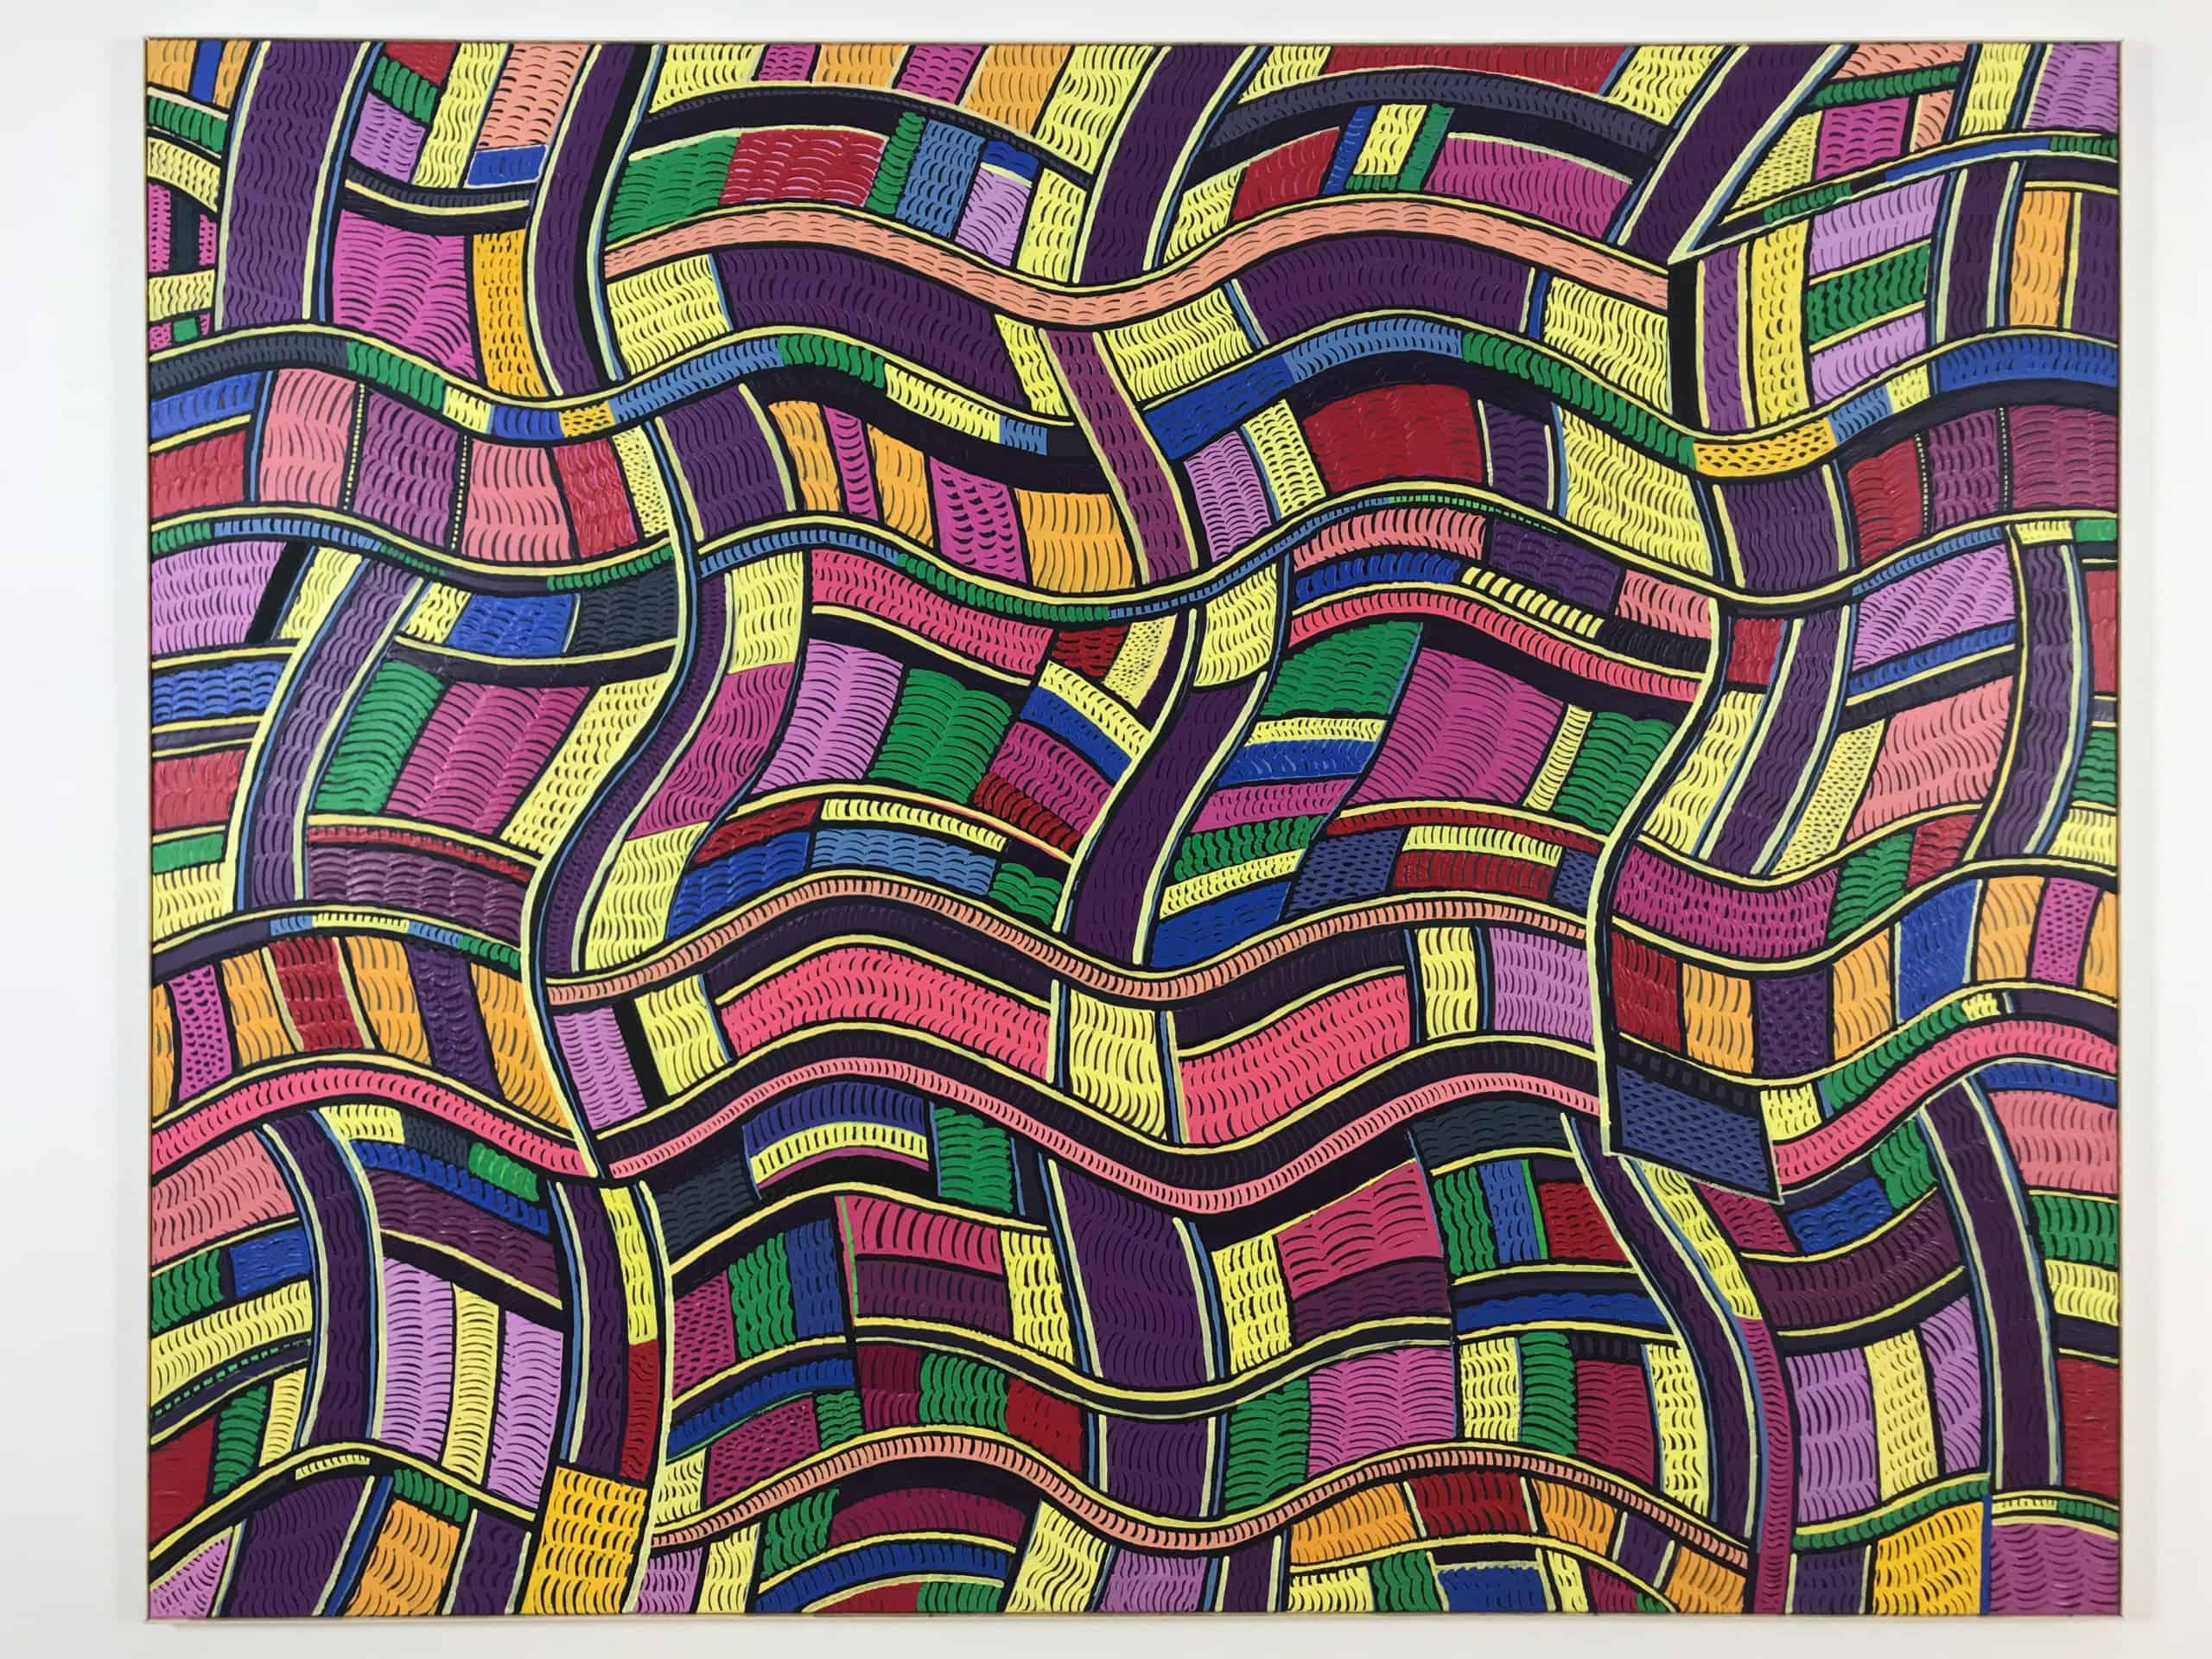 f7-2016-11_(sold)_Tulip-Fields-2_200x160cm_acrylic-on-canvas